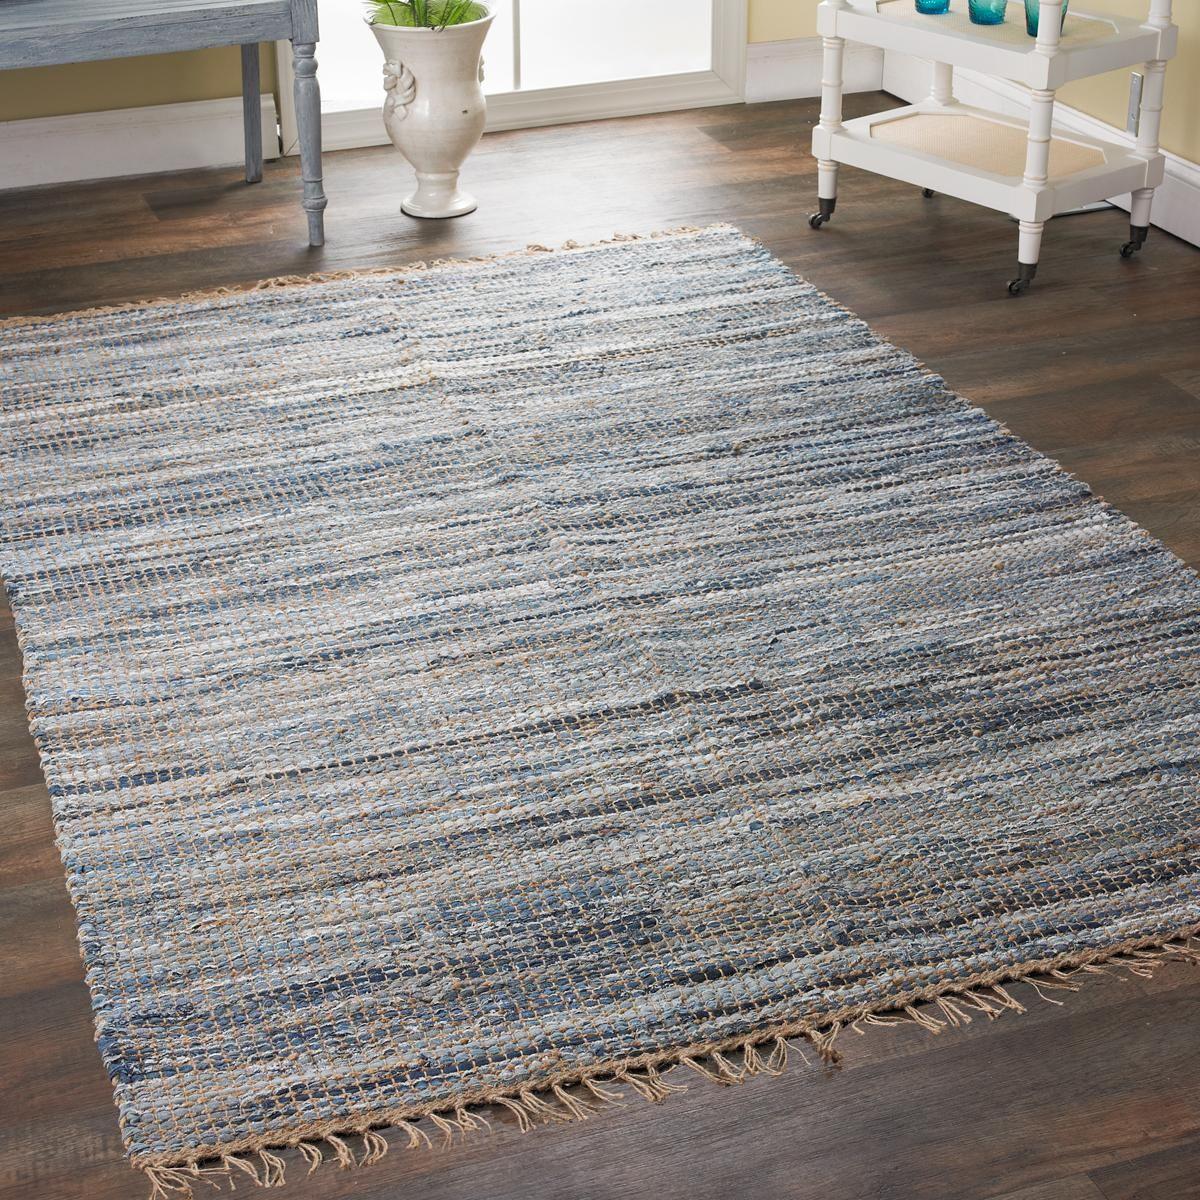 Denim And Rope Area Rug Farmhouse Area Rugs Rugs On Carpet Area Rugs